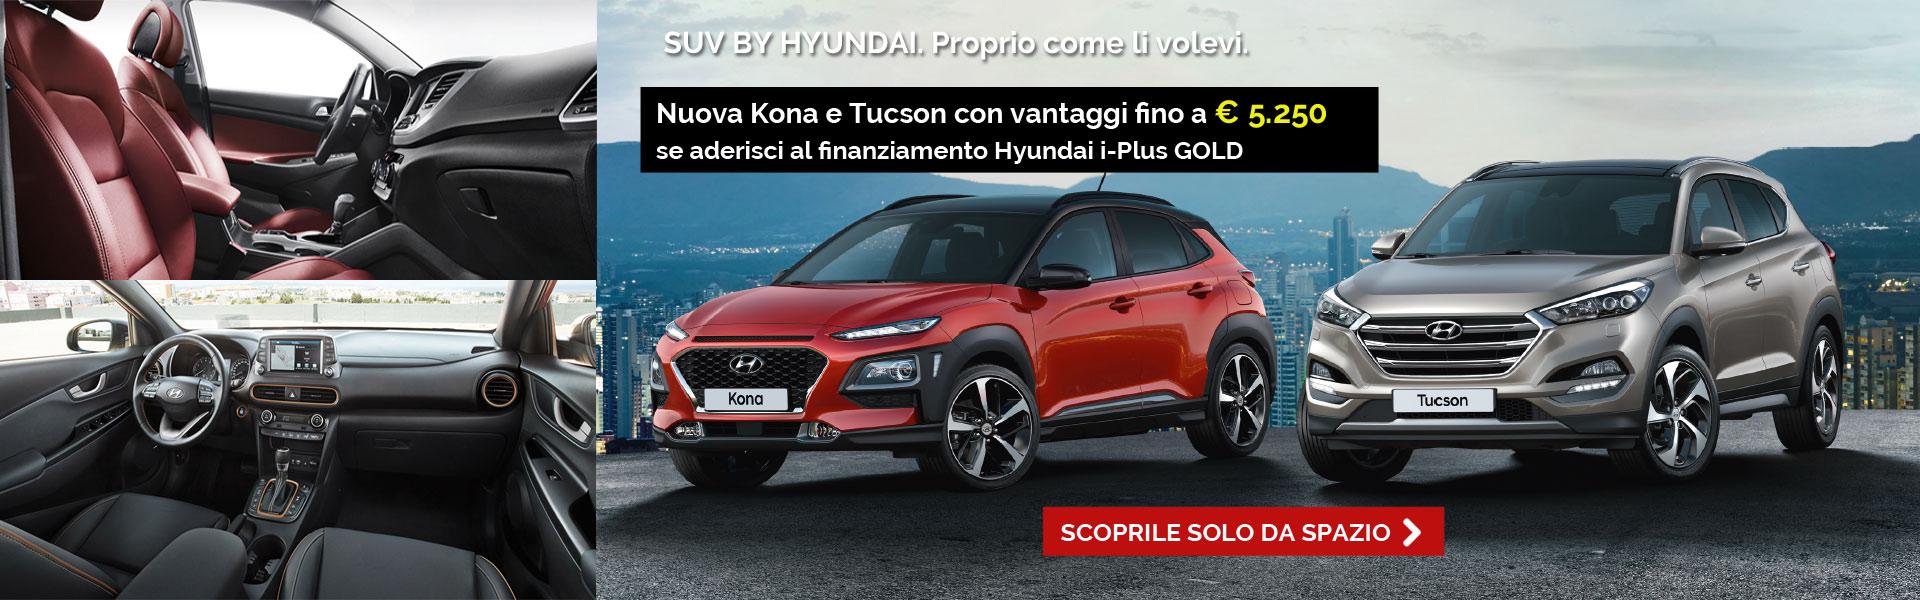 Hyundai gamma SUV Kona Tucson